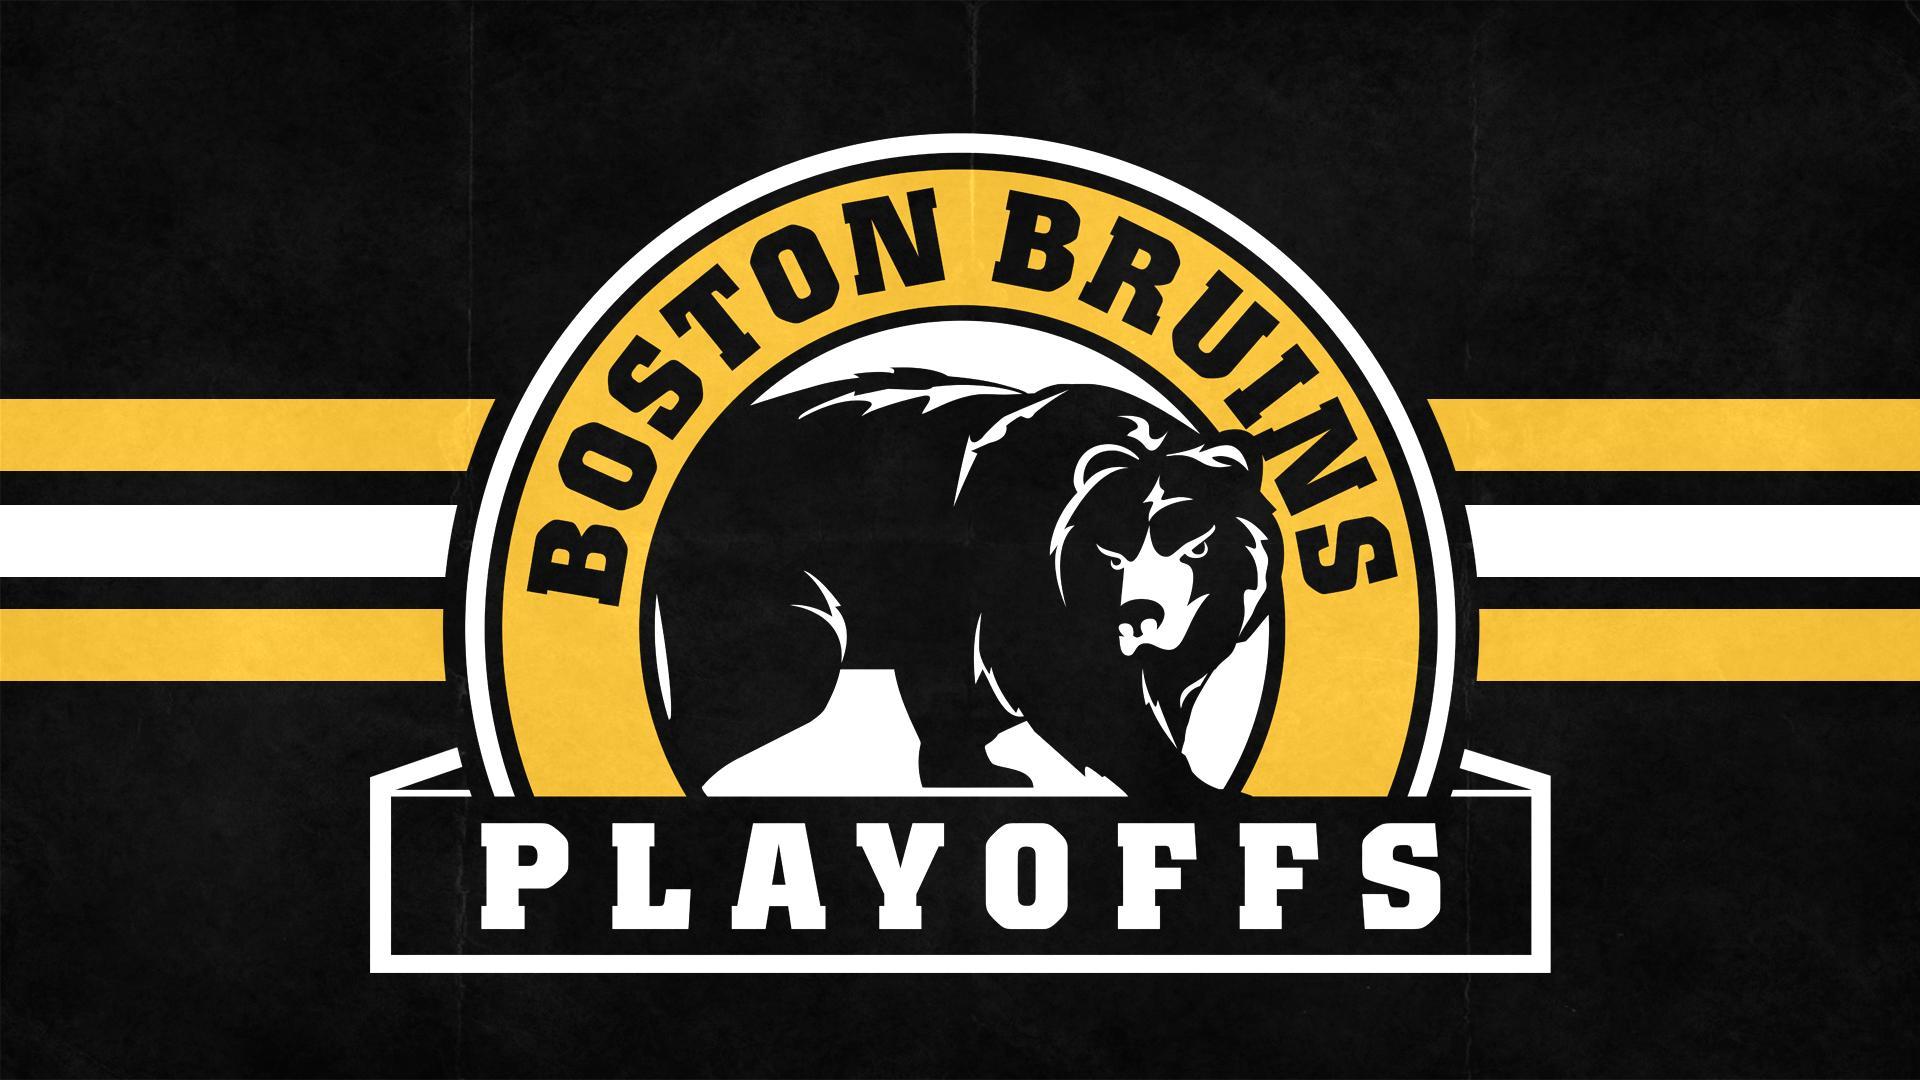 Boston-Bruins-1920%C3%971080-Boston-Bruins-Backgrounds-Adorable-wallpaper-wp3603679